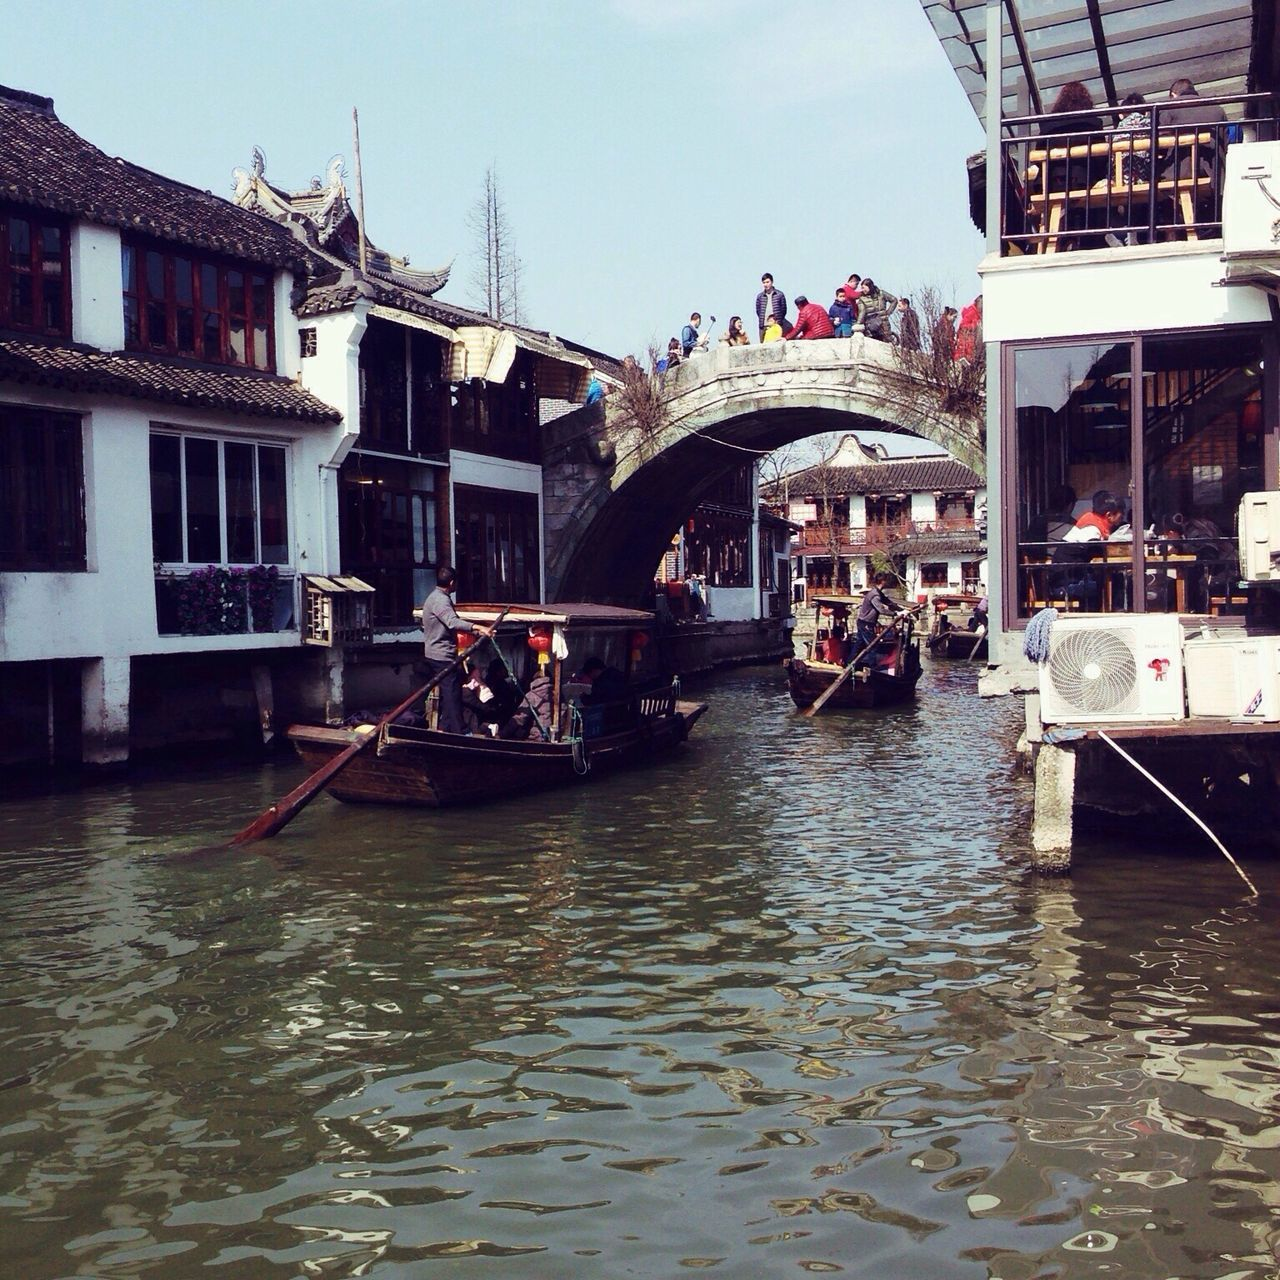 Architecture Water Bridge - Man Made Structure Travel Destinations Zhujiajiao Shanghai China